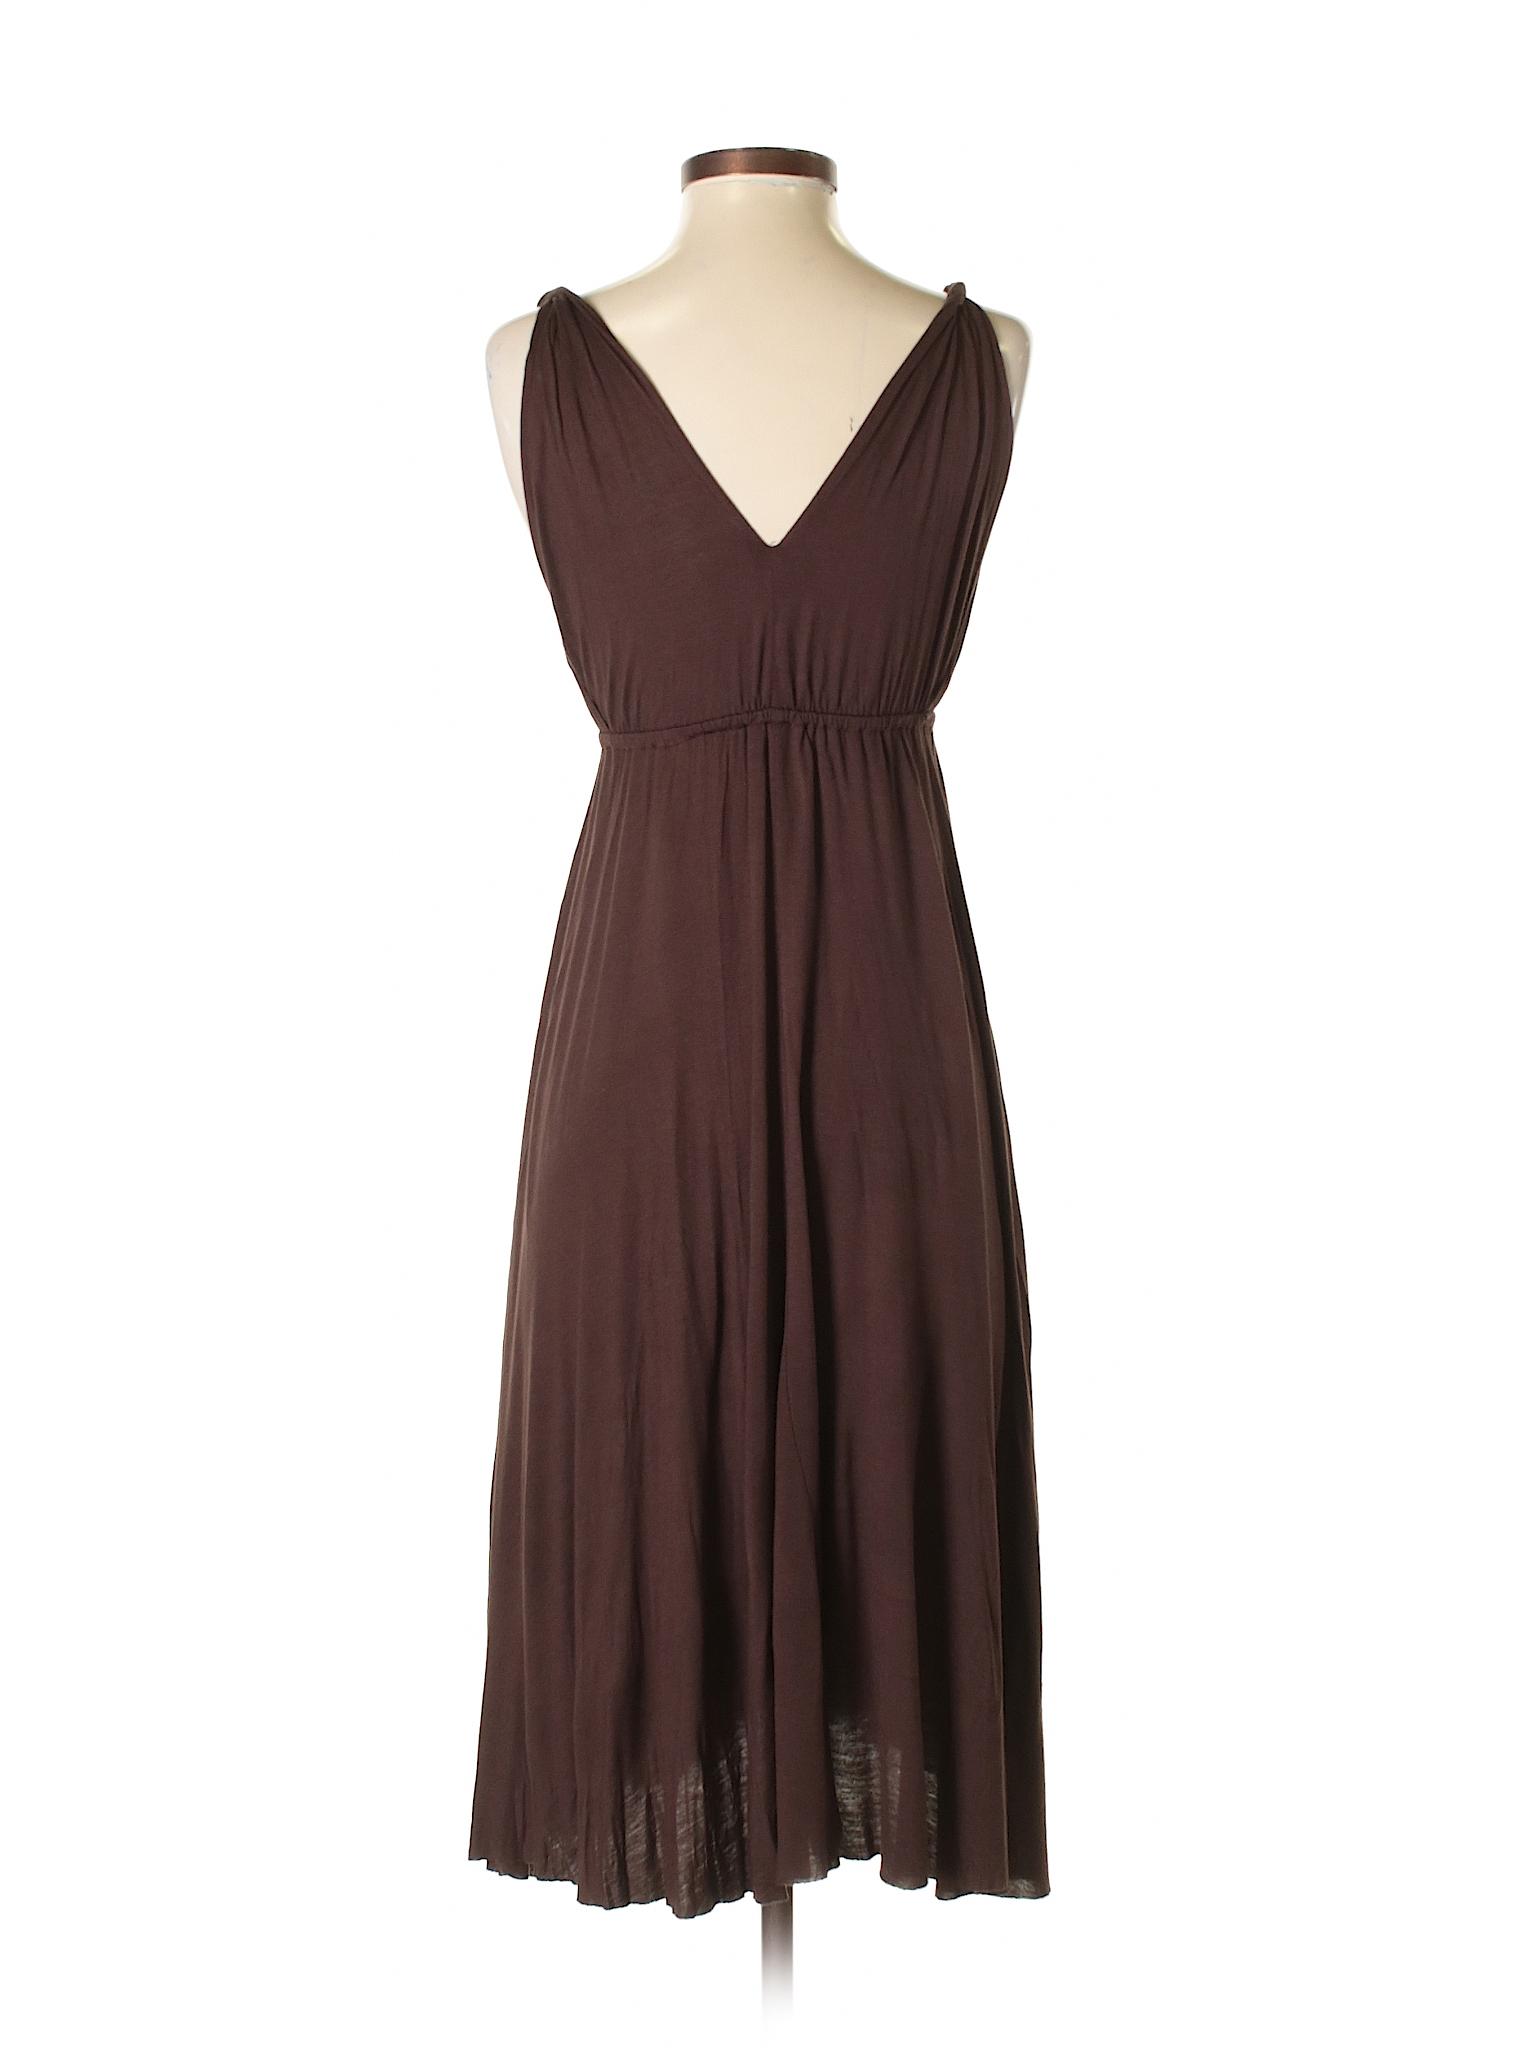 3d6a0ea25aff Maje 100% Viscose Solid Brown Casual Dress Size XS Tall (0) (Tall) - 99%  off   thredUP